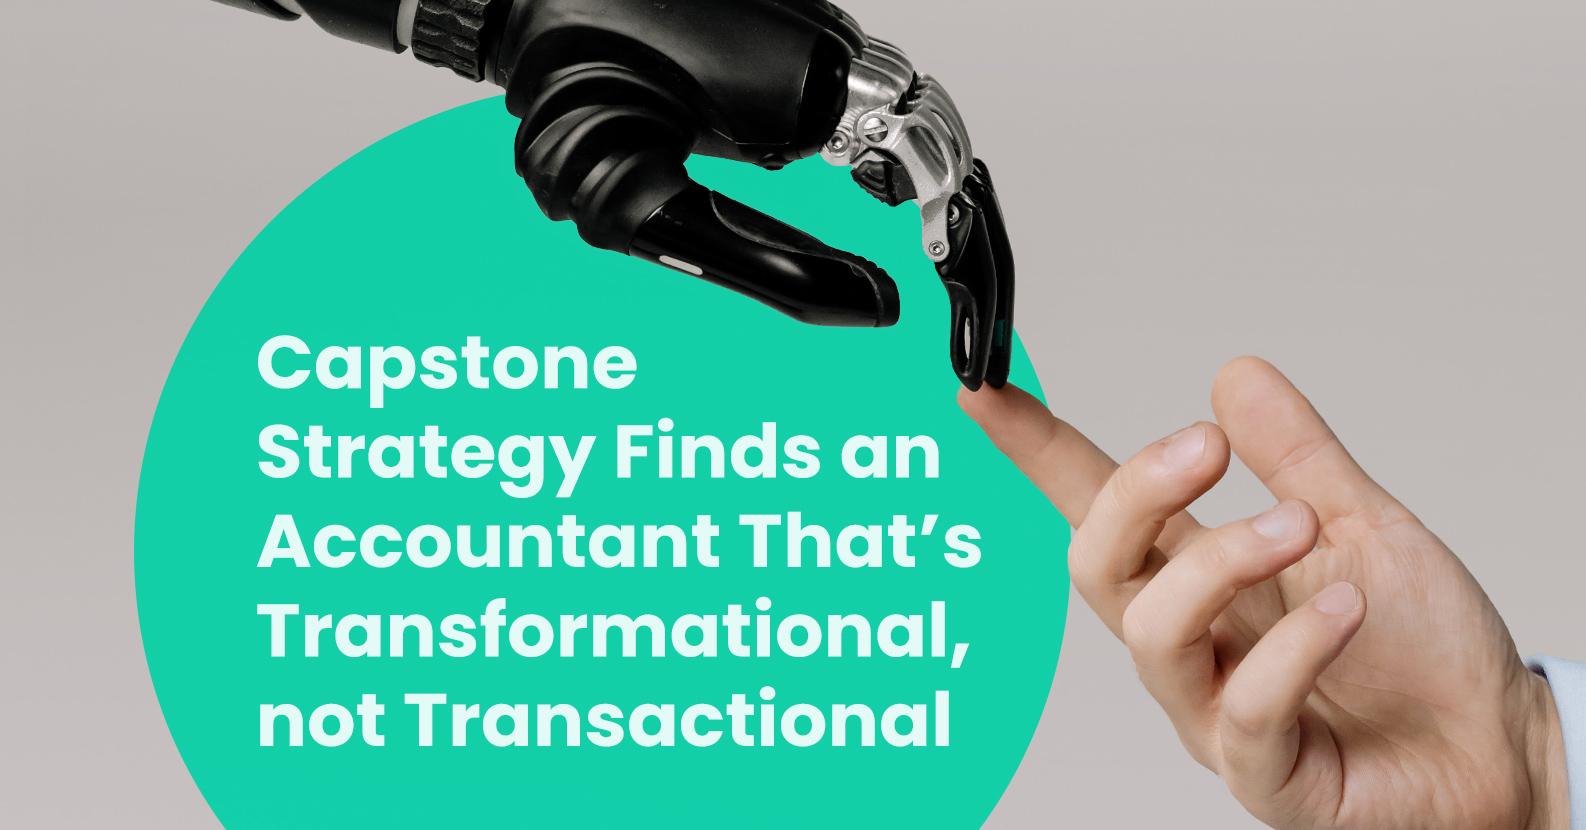 IS_Capstone Strategy Tranformational Accountant SM copy